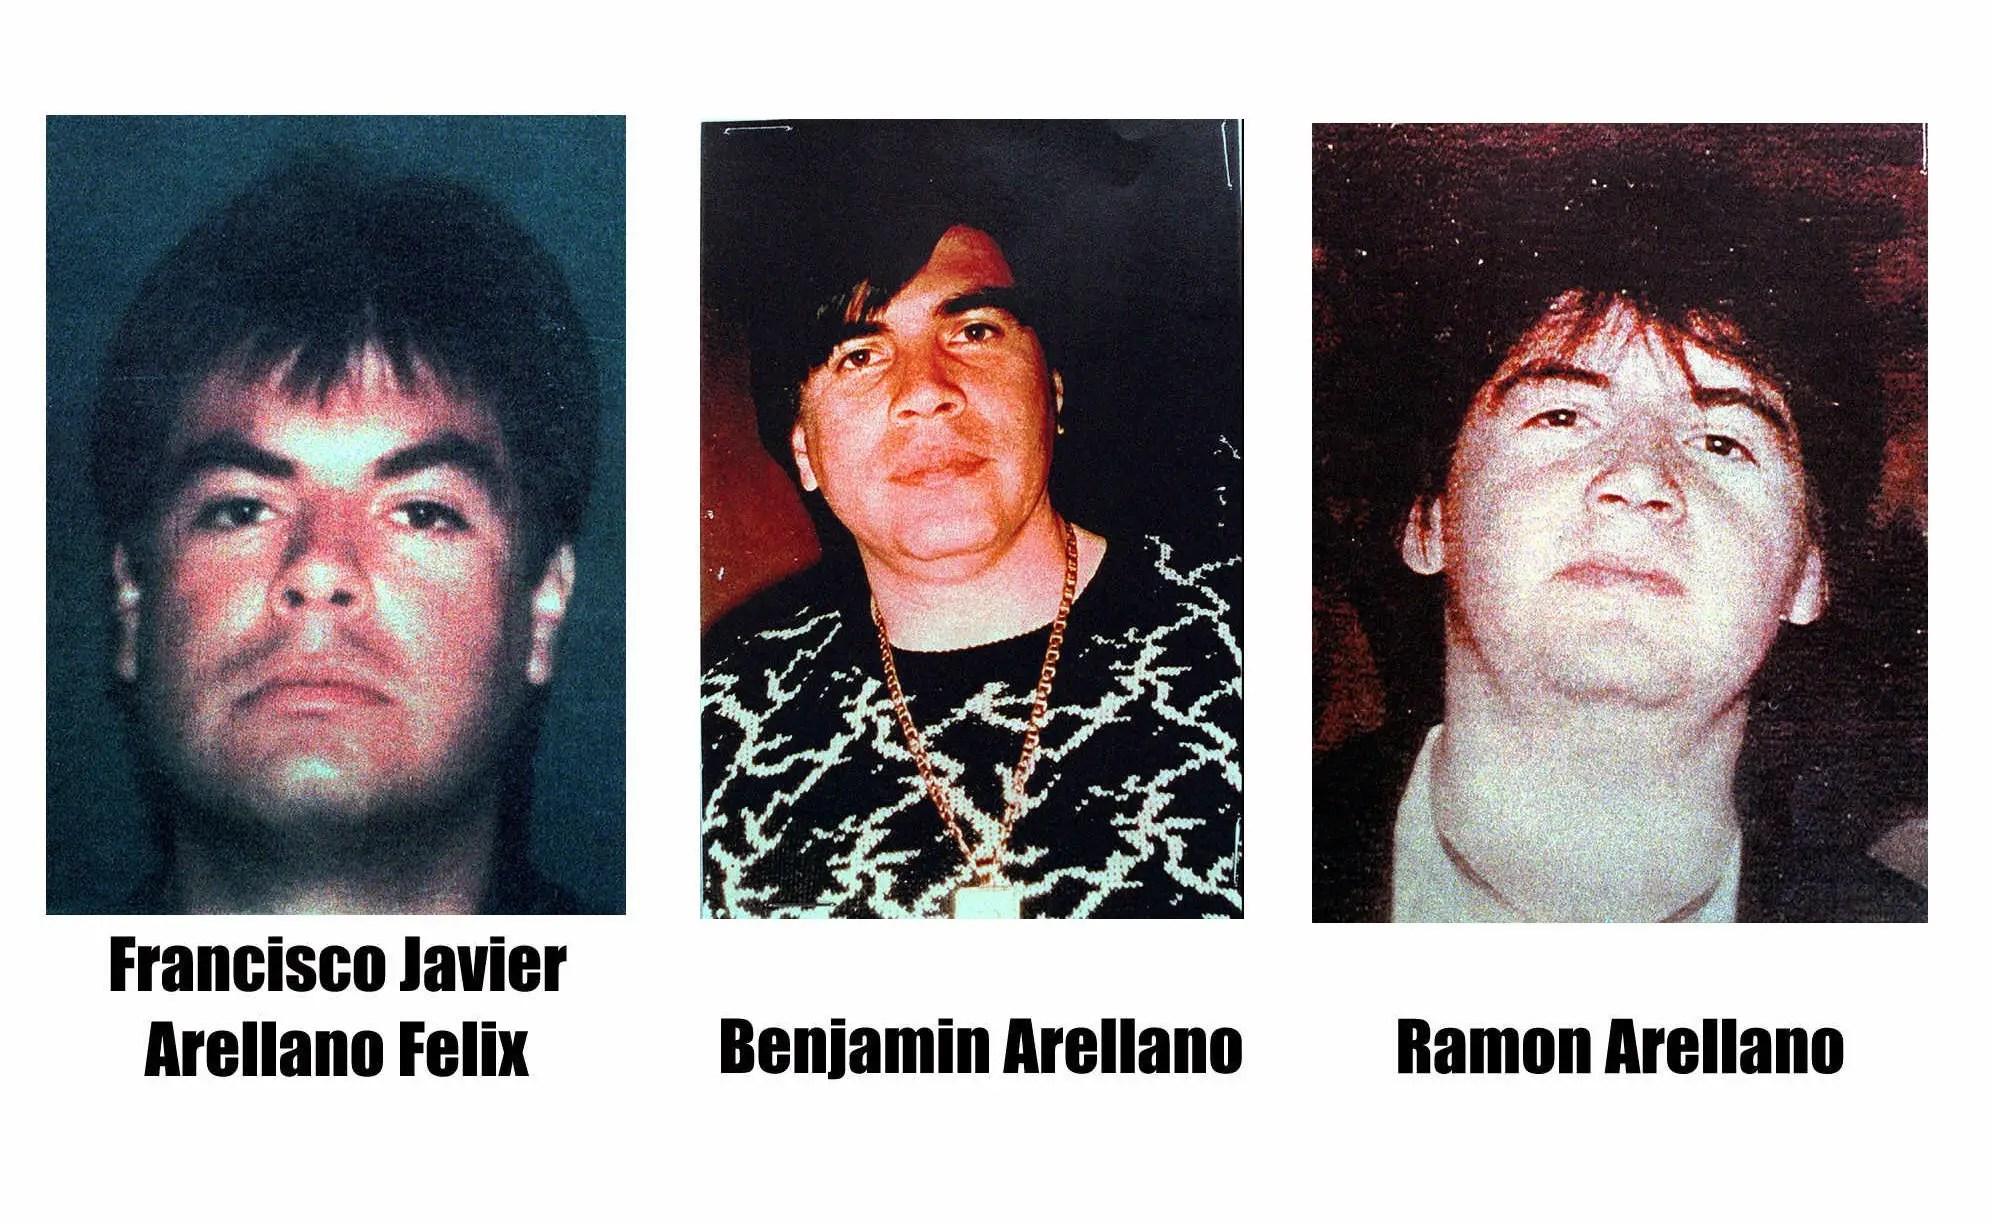 Arellano Felix brothers Mexico Tijuana cartel drug traffickers extradition